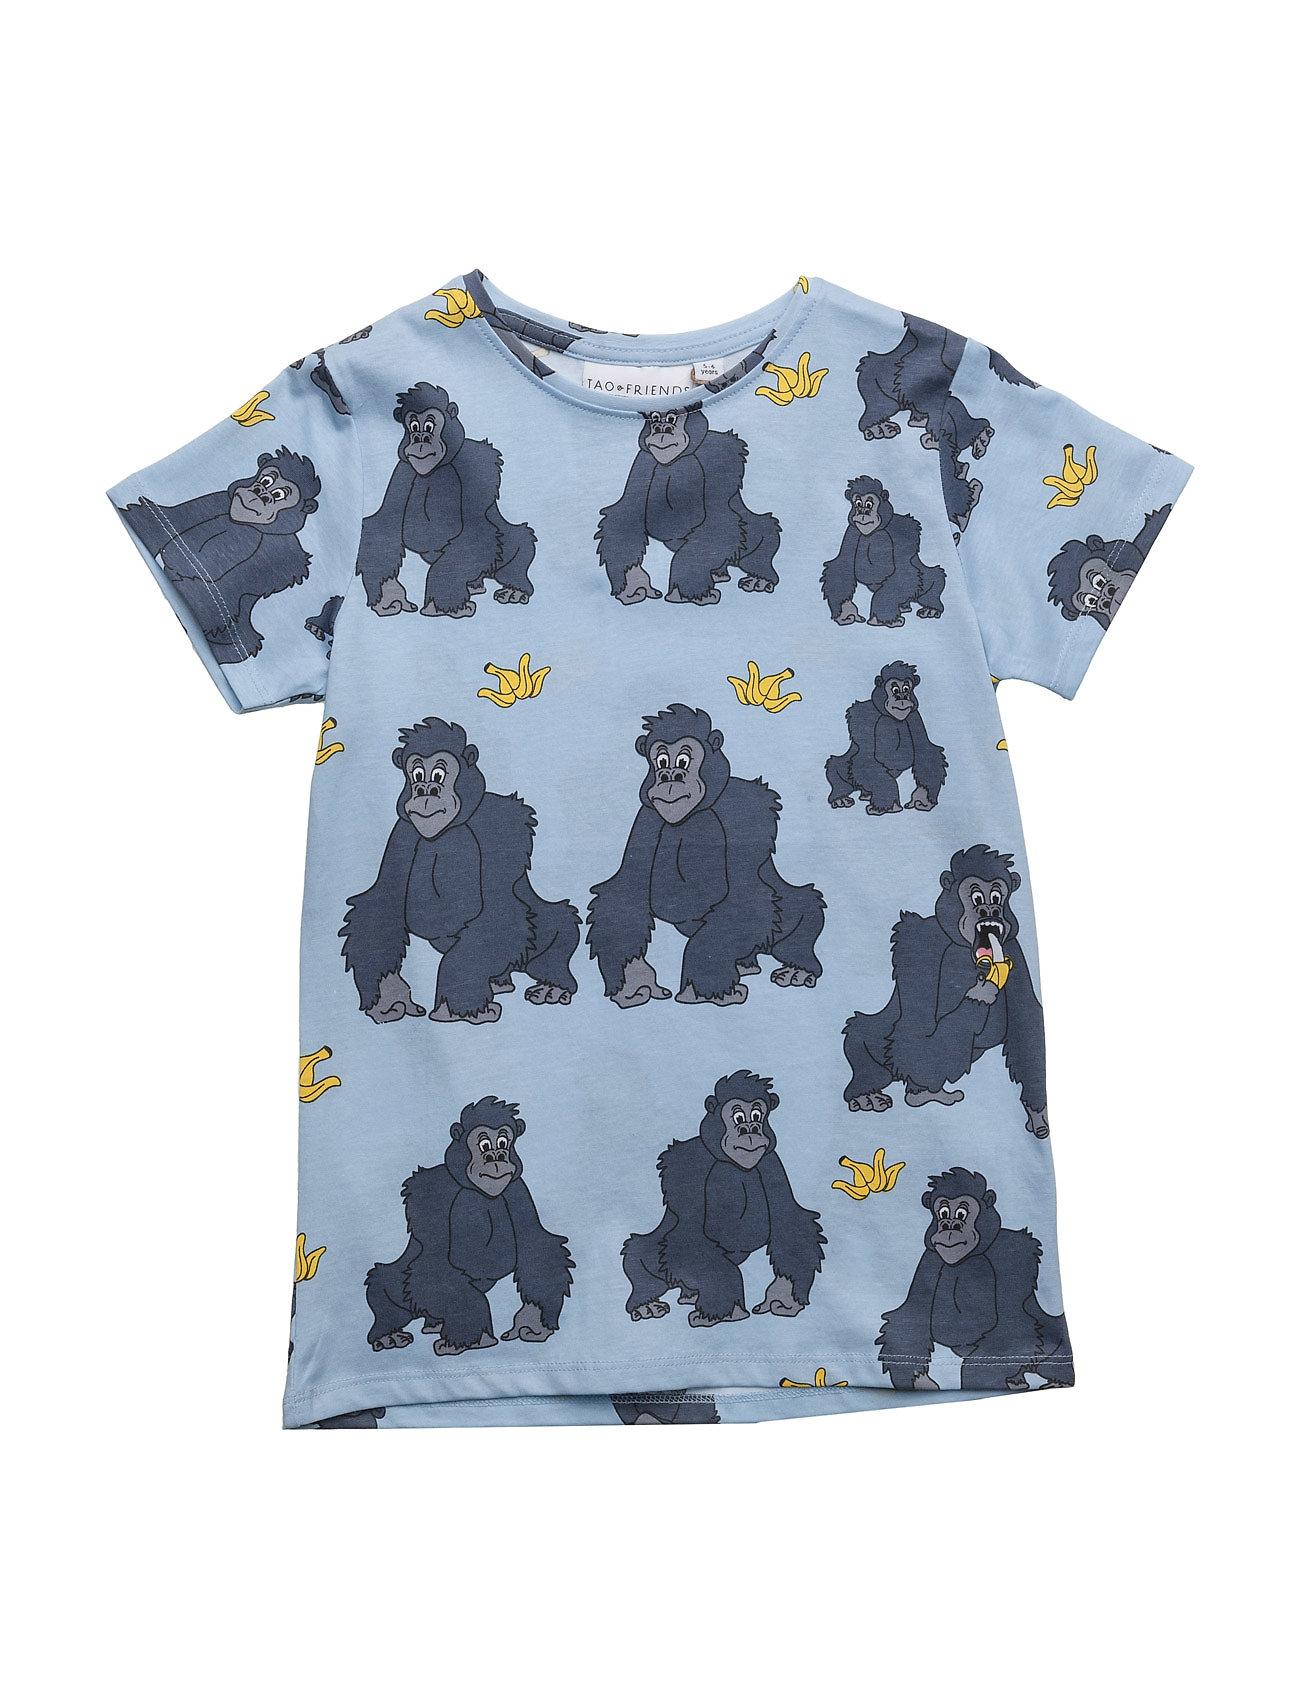 tao & friends Tee gorillan multi-animal blue fra boozt.com dk